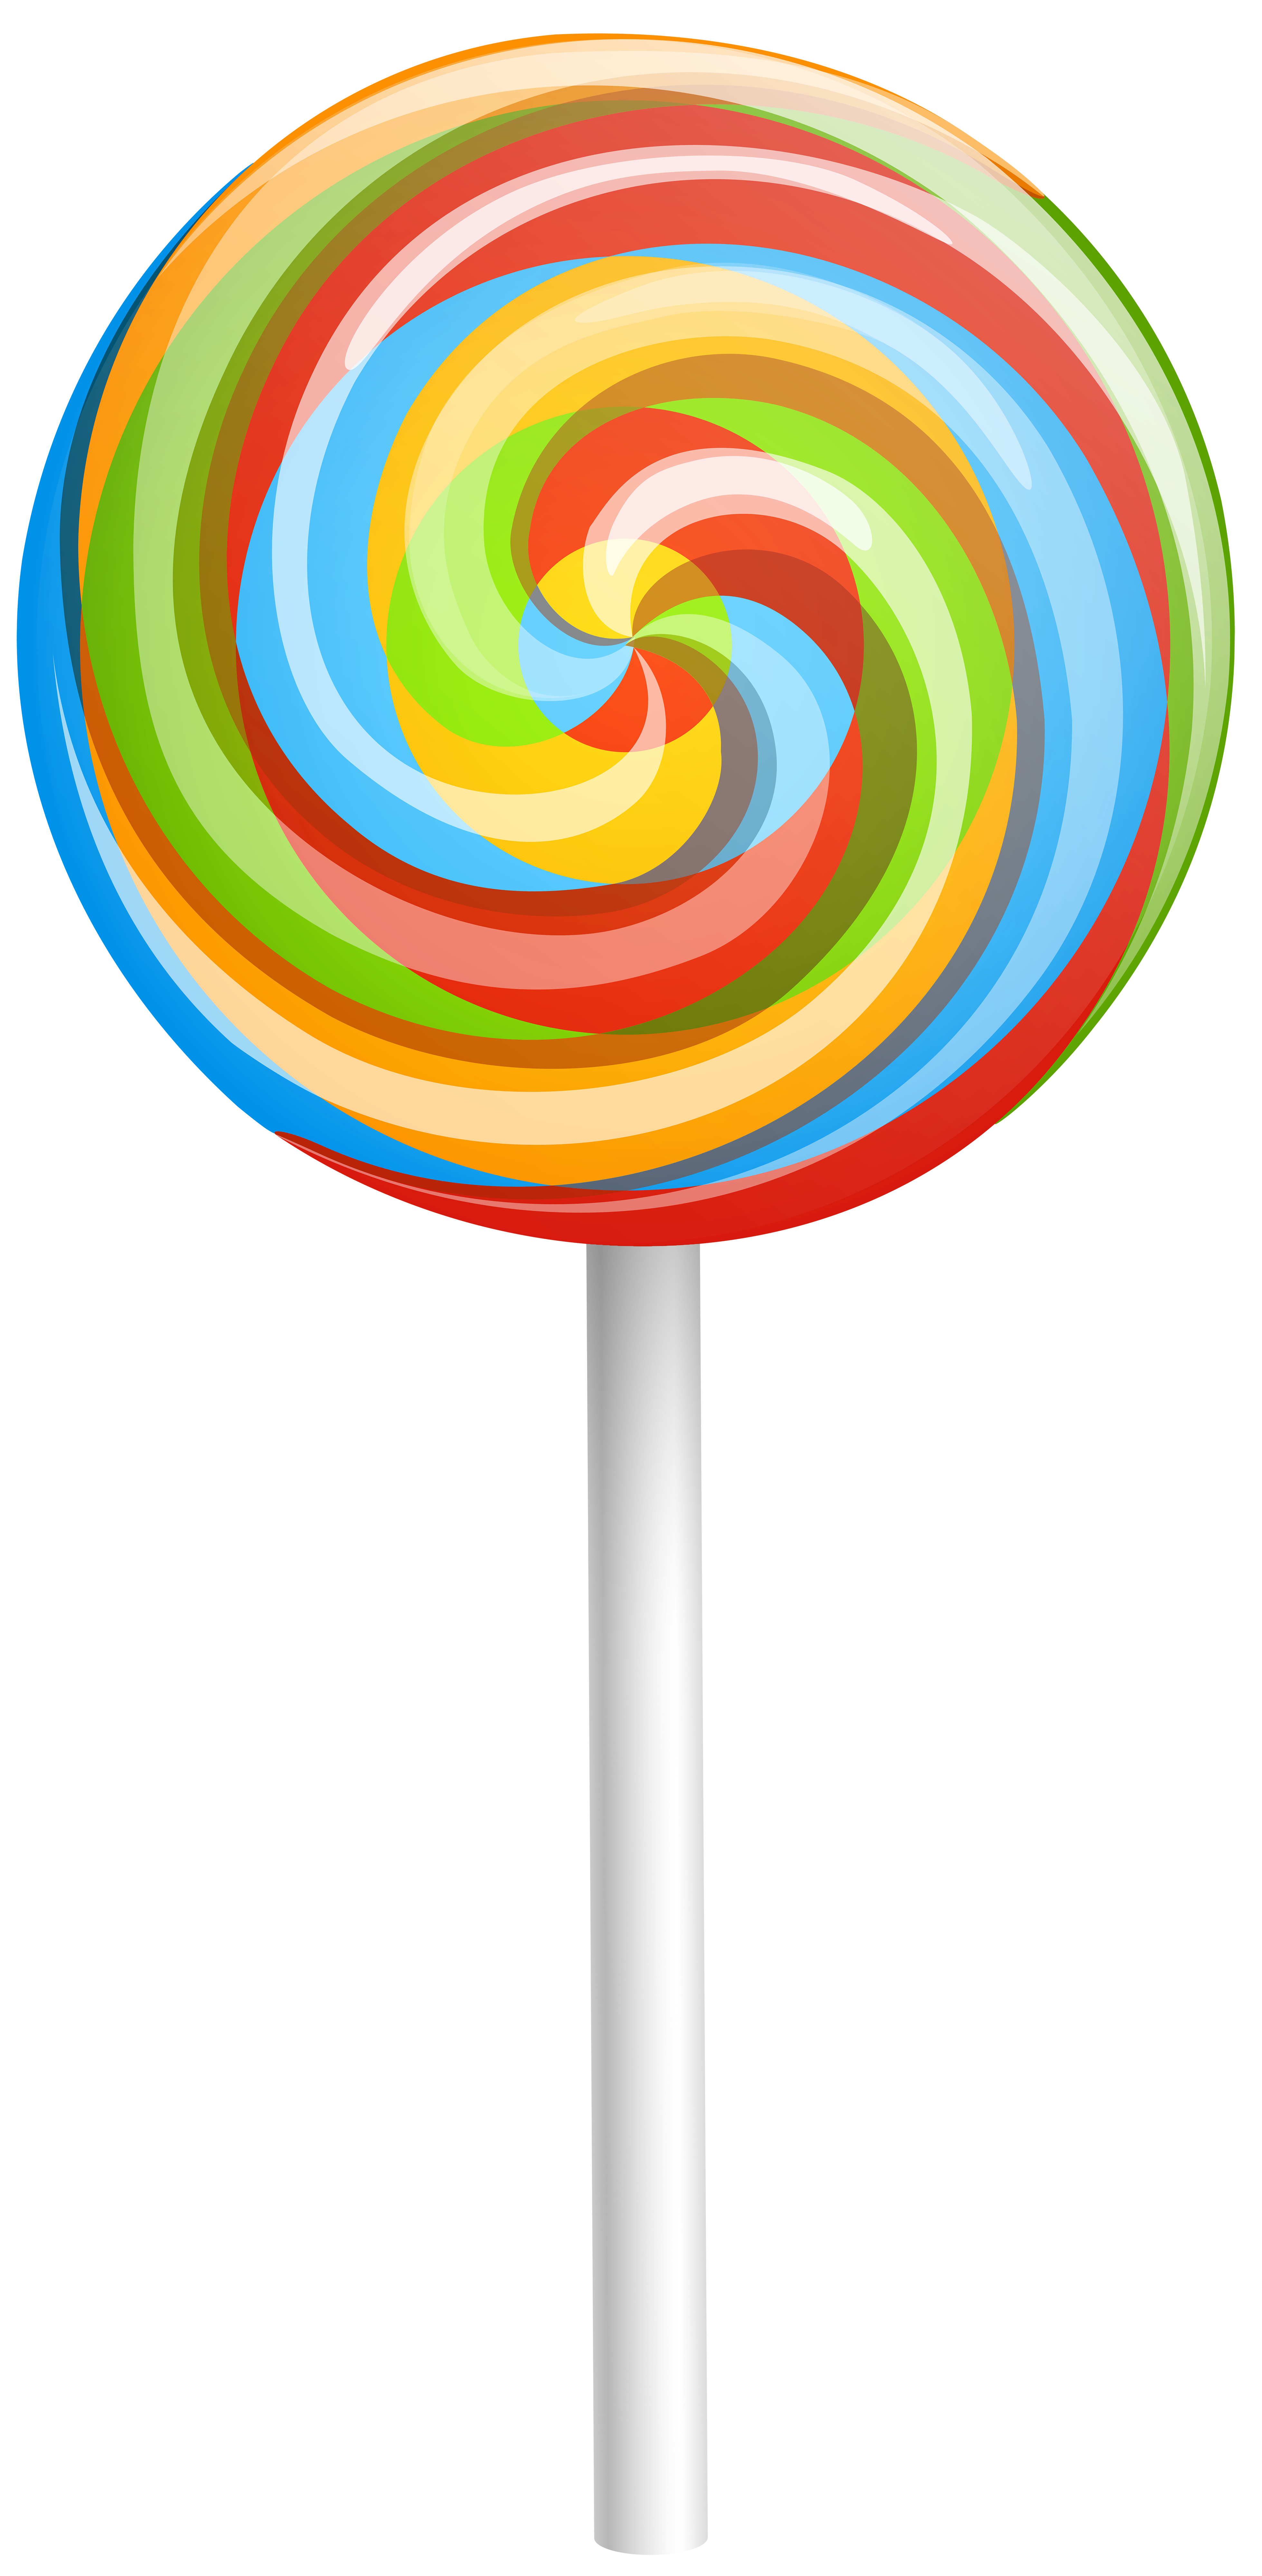 3919x8000 Candy Clipart Swirl Lollipop